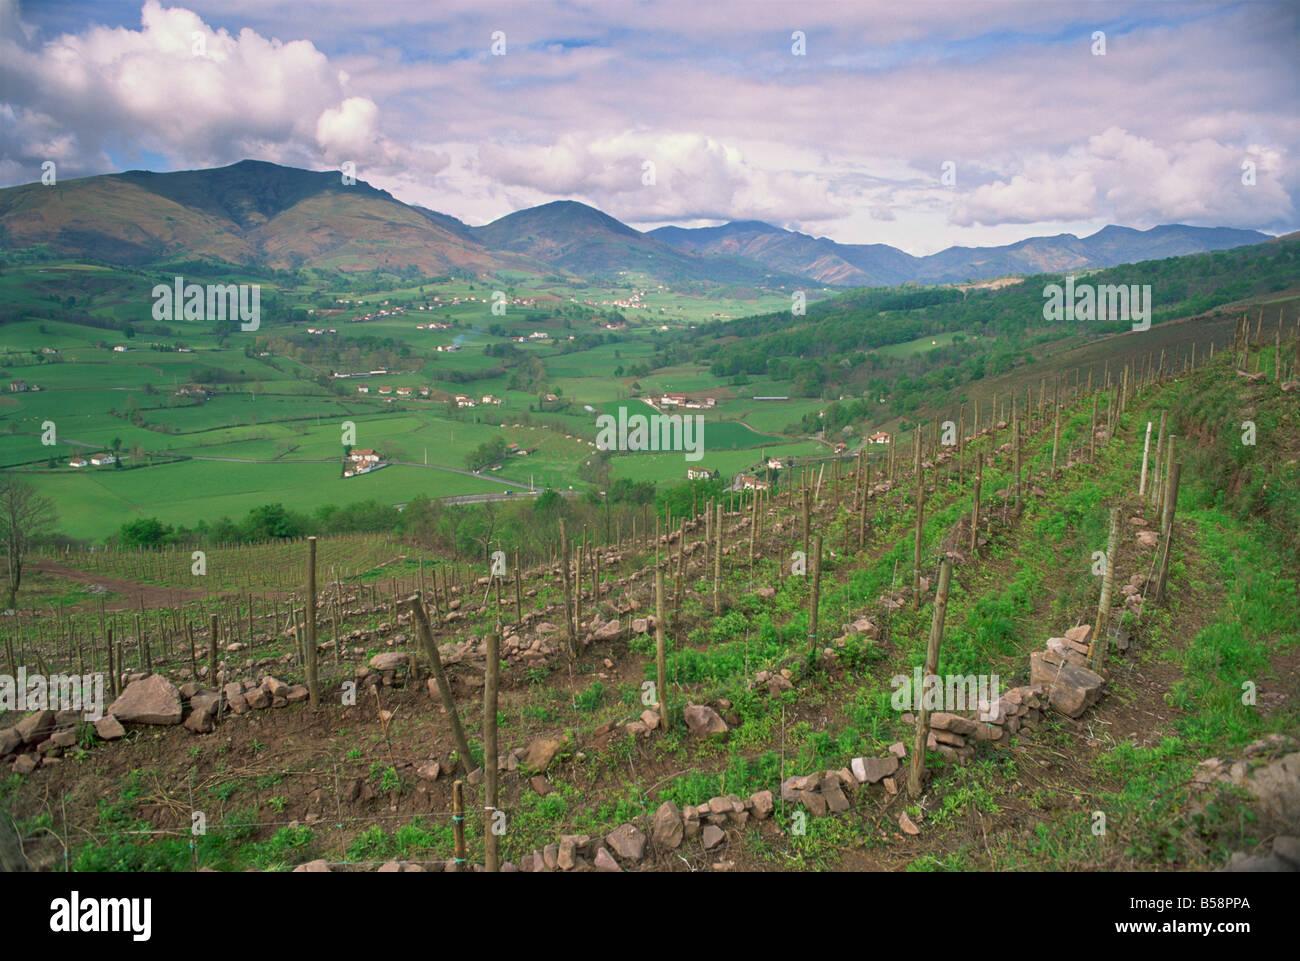 Vineyards near St. Jean Pied de Port, Basque area, Aquitaine, France, Europe - Stock Image